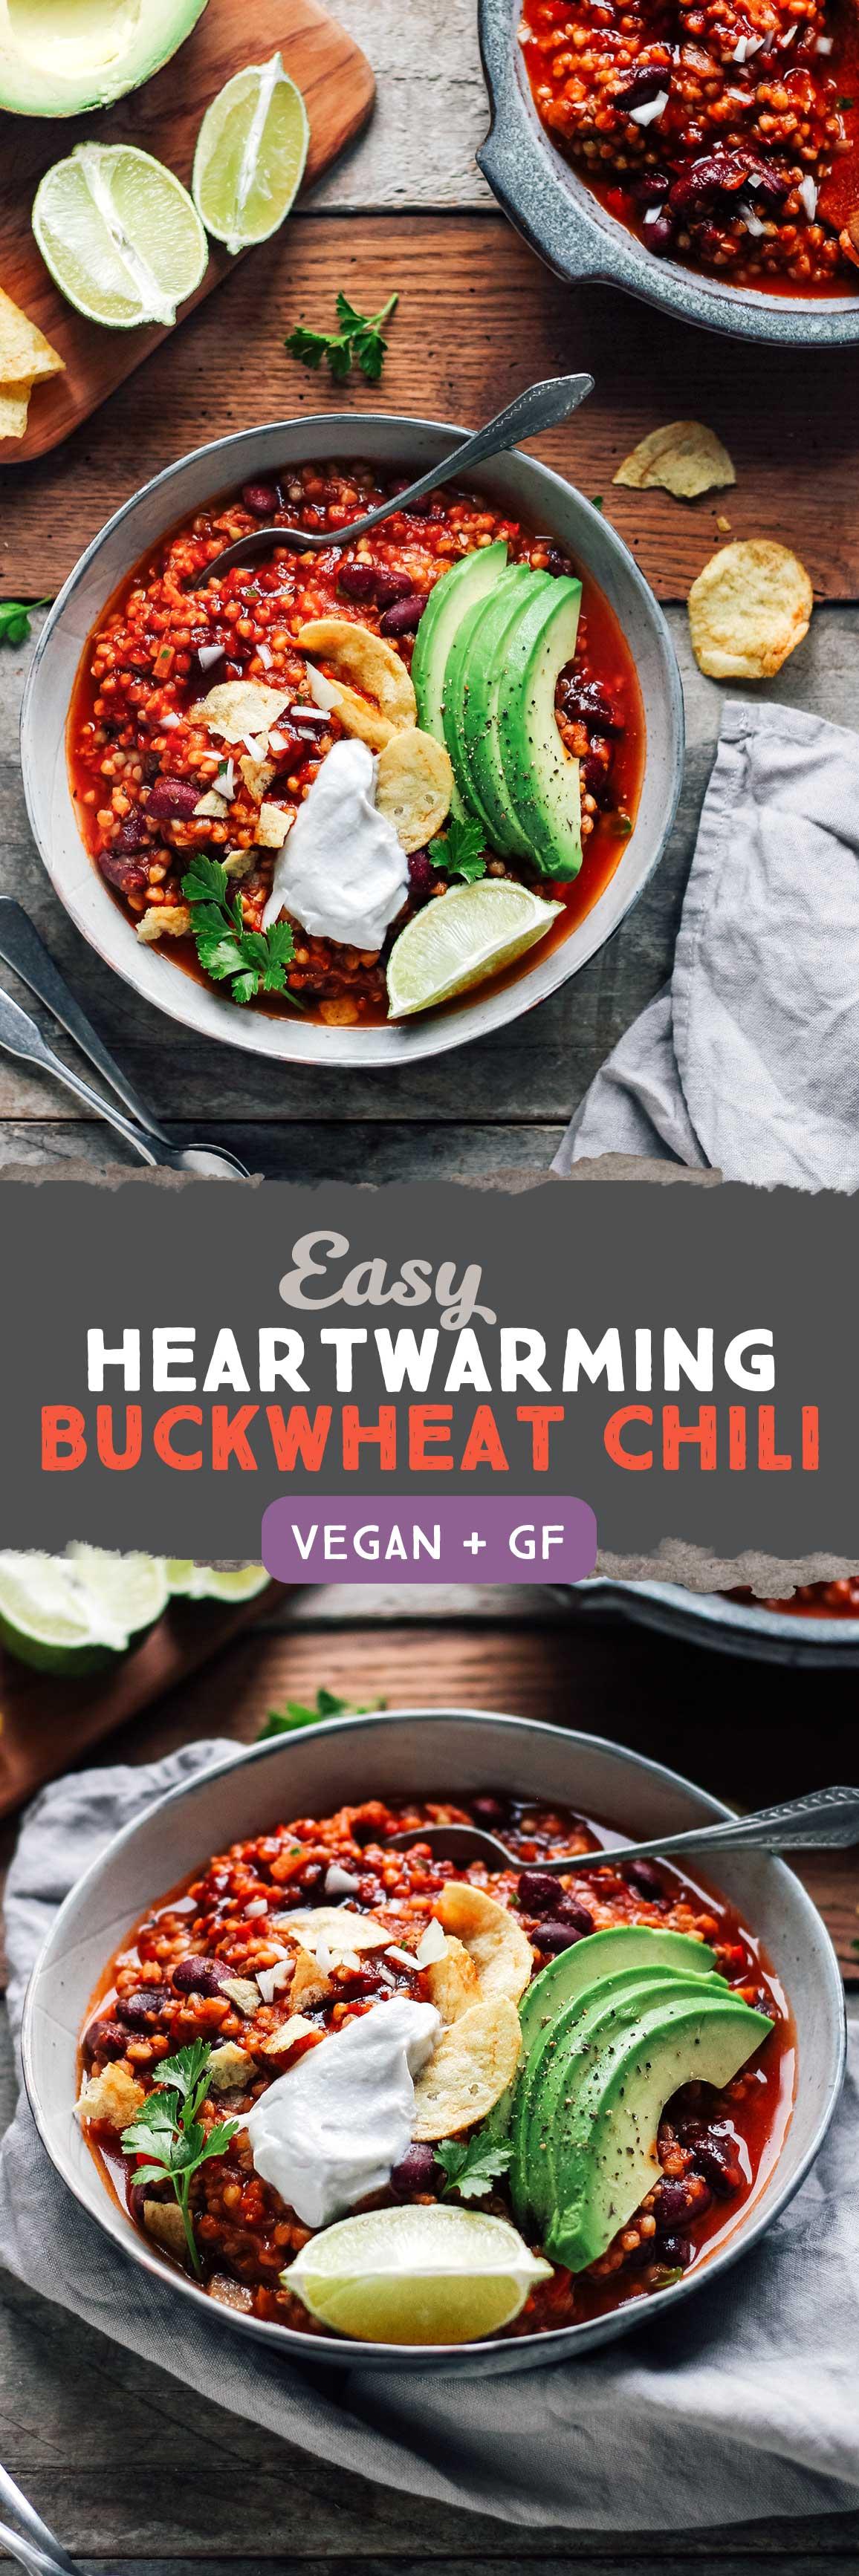 Easy Heartwarming Buckwheat Chili